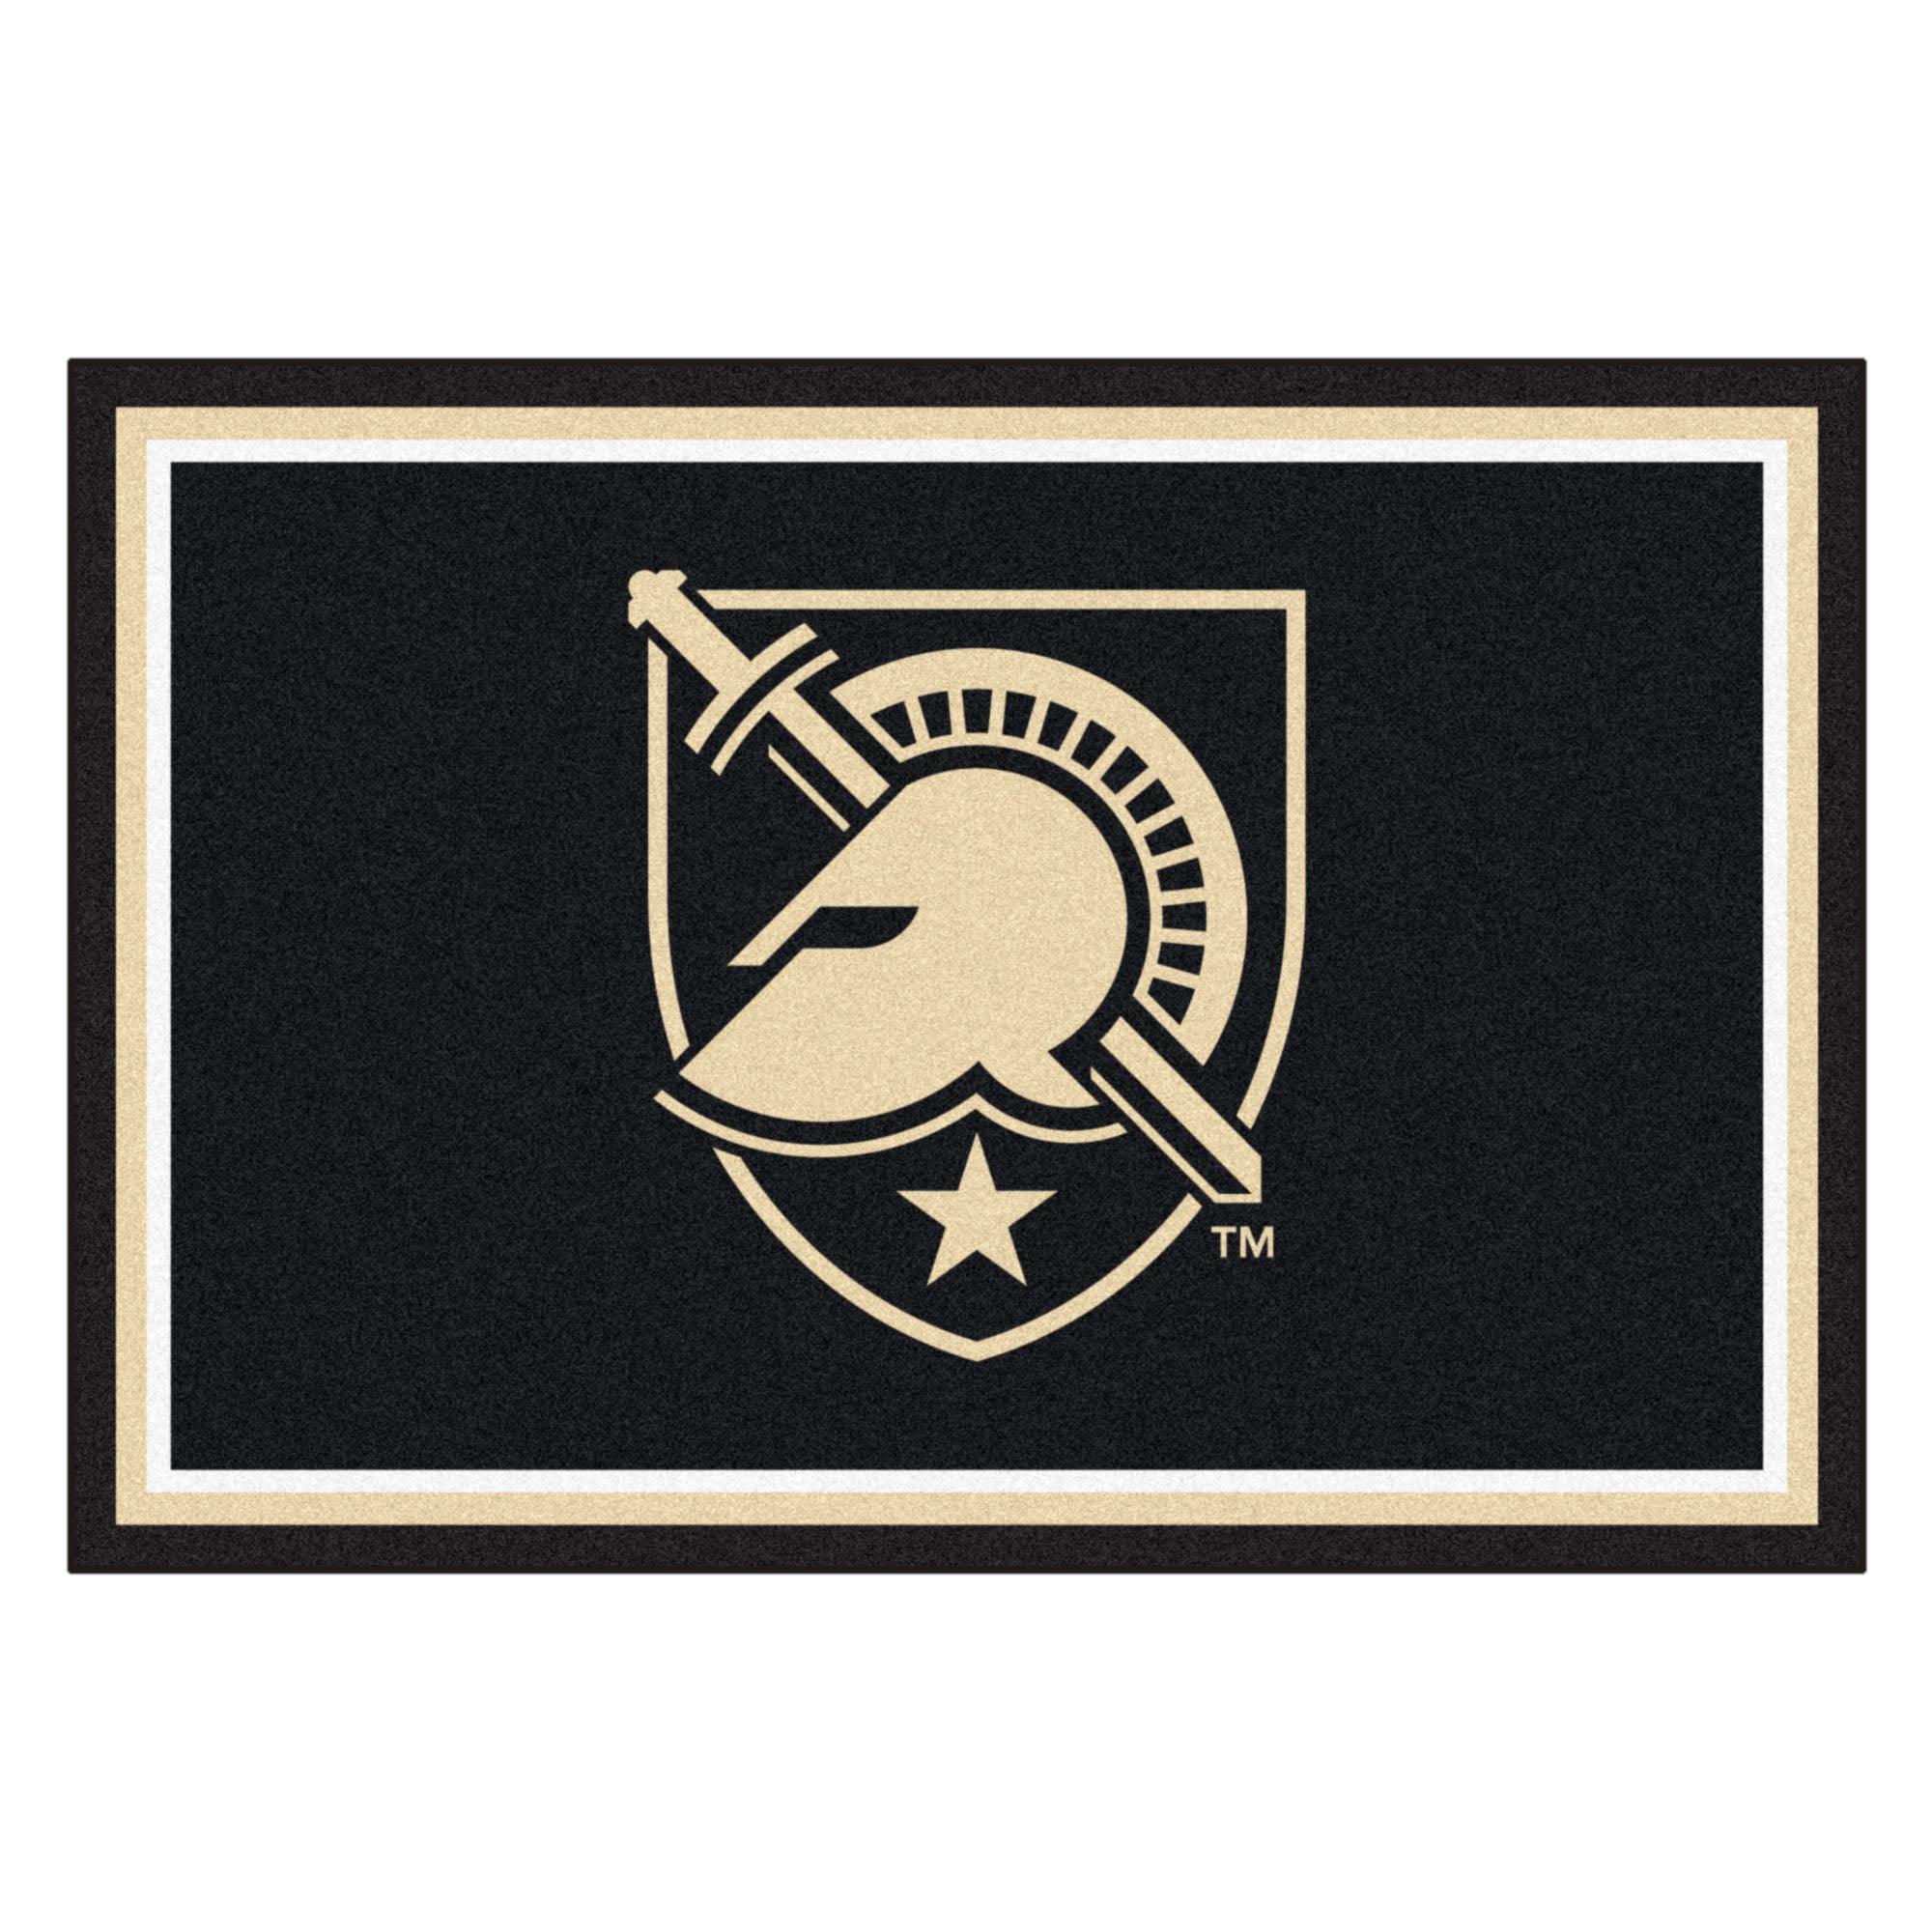 U.S. Military Academy 5 x 8 Foot Plush Non-Skid Area Rug